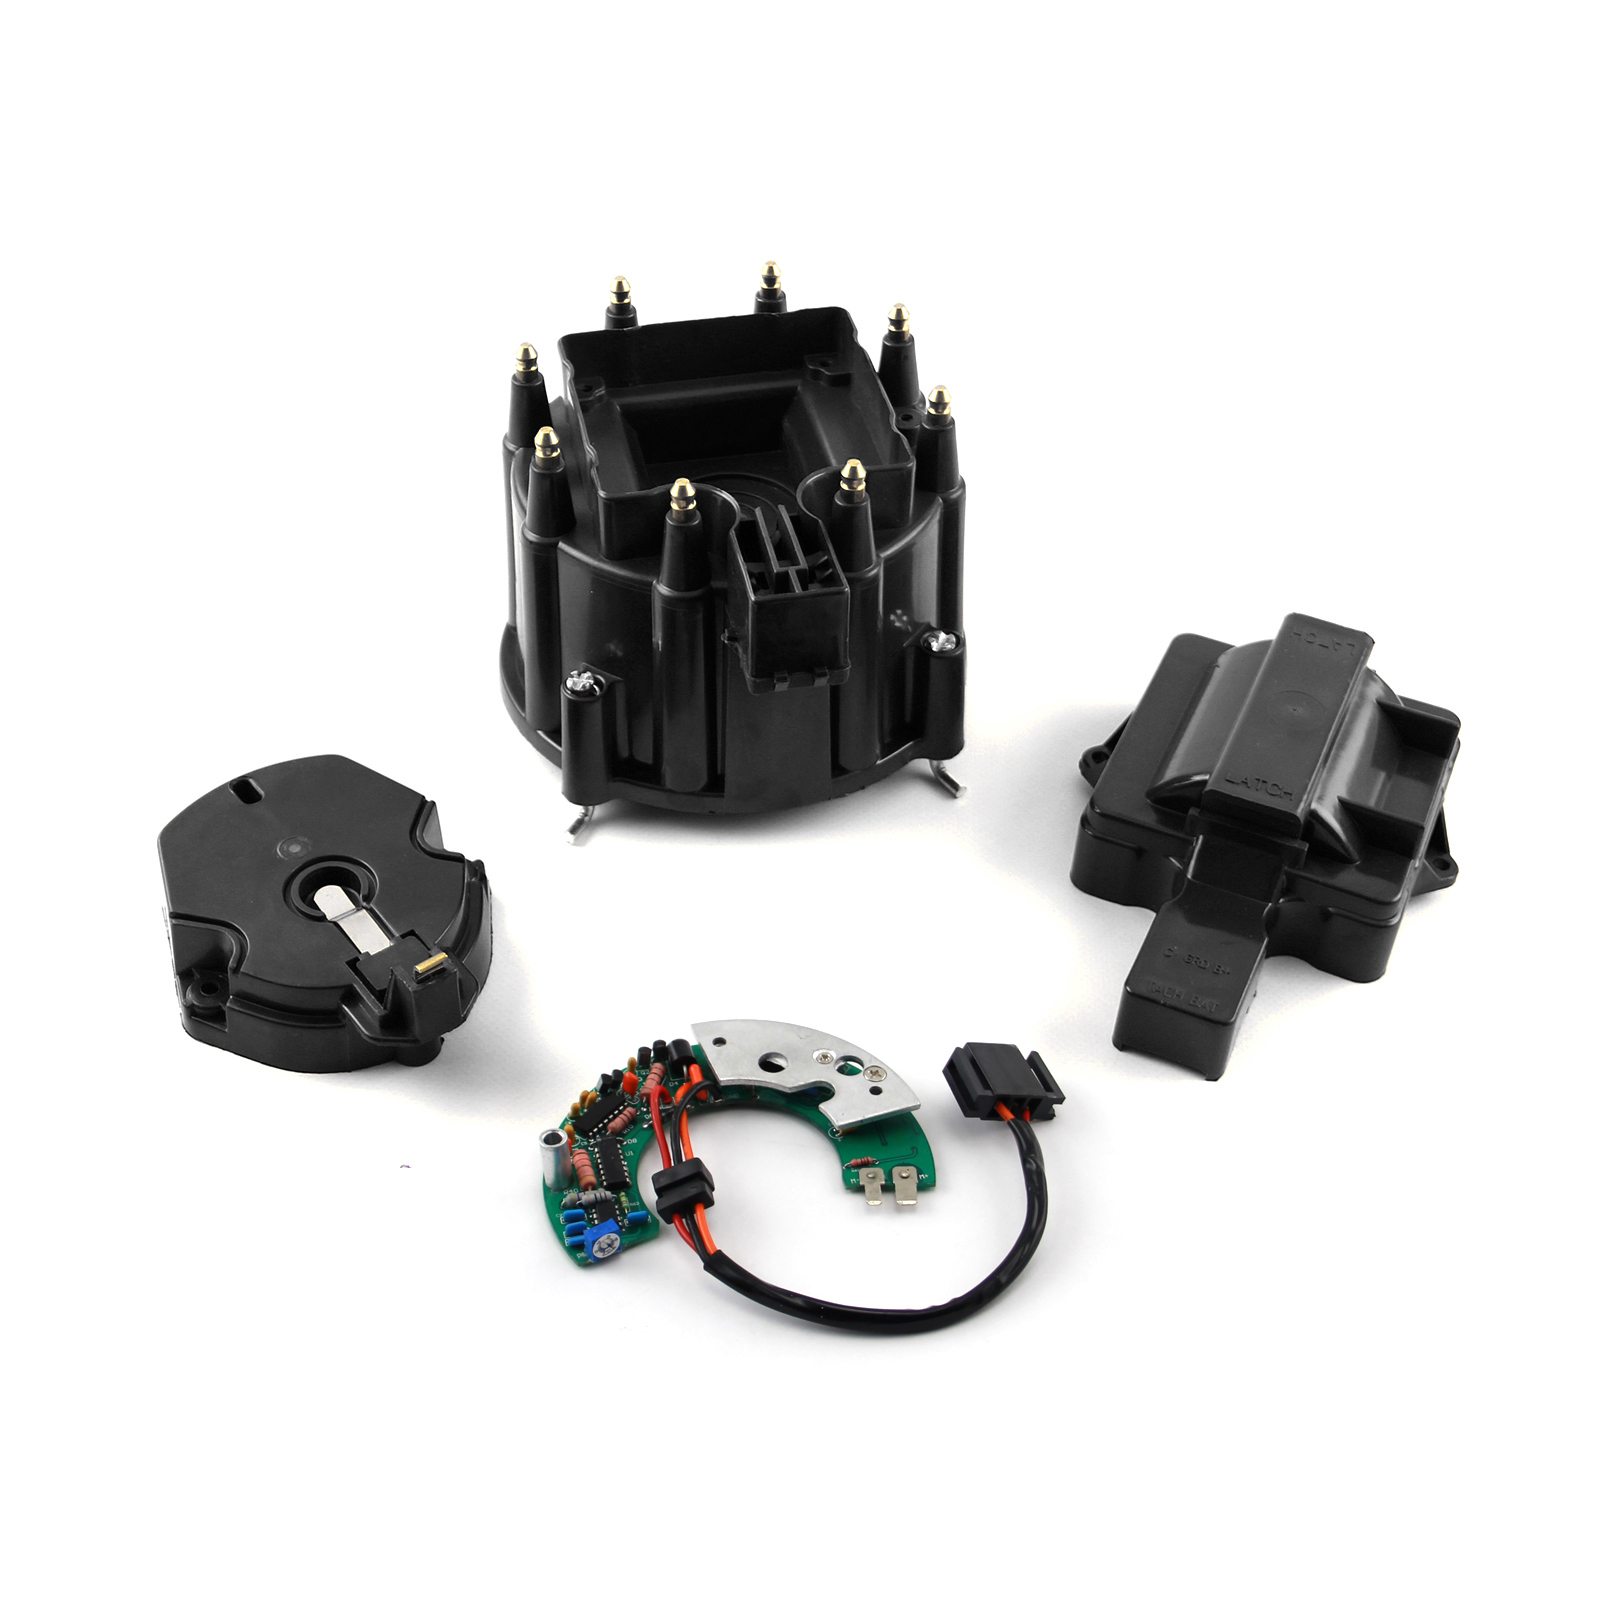 Chevy SBC BBC HEI Distributor Cap Rotor & Module Kit - Black